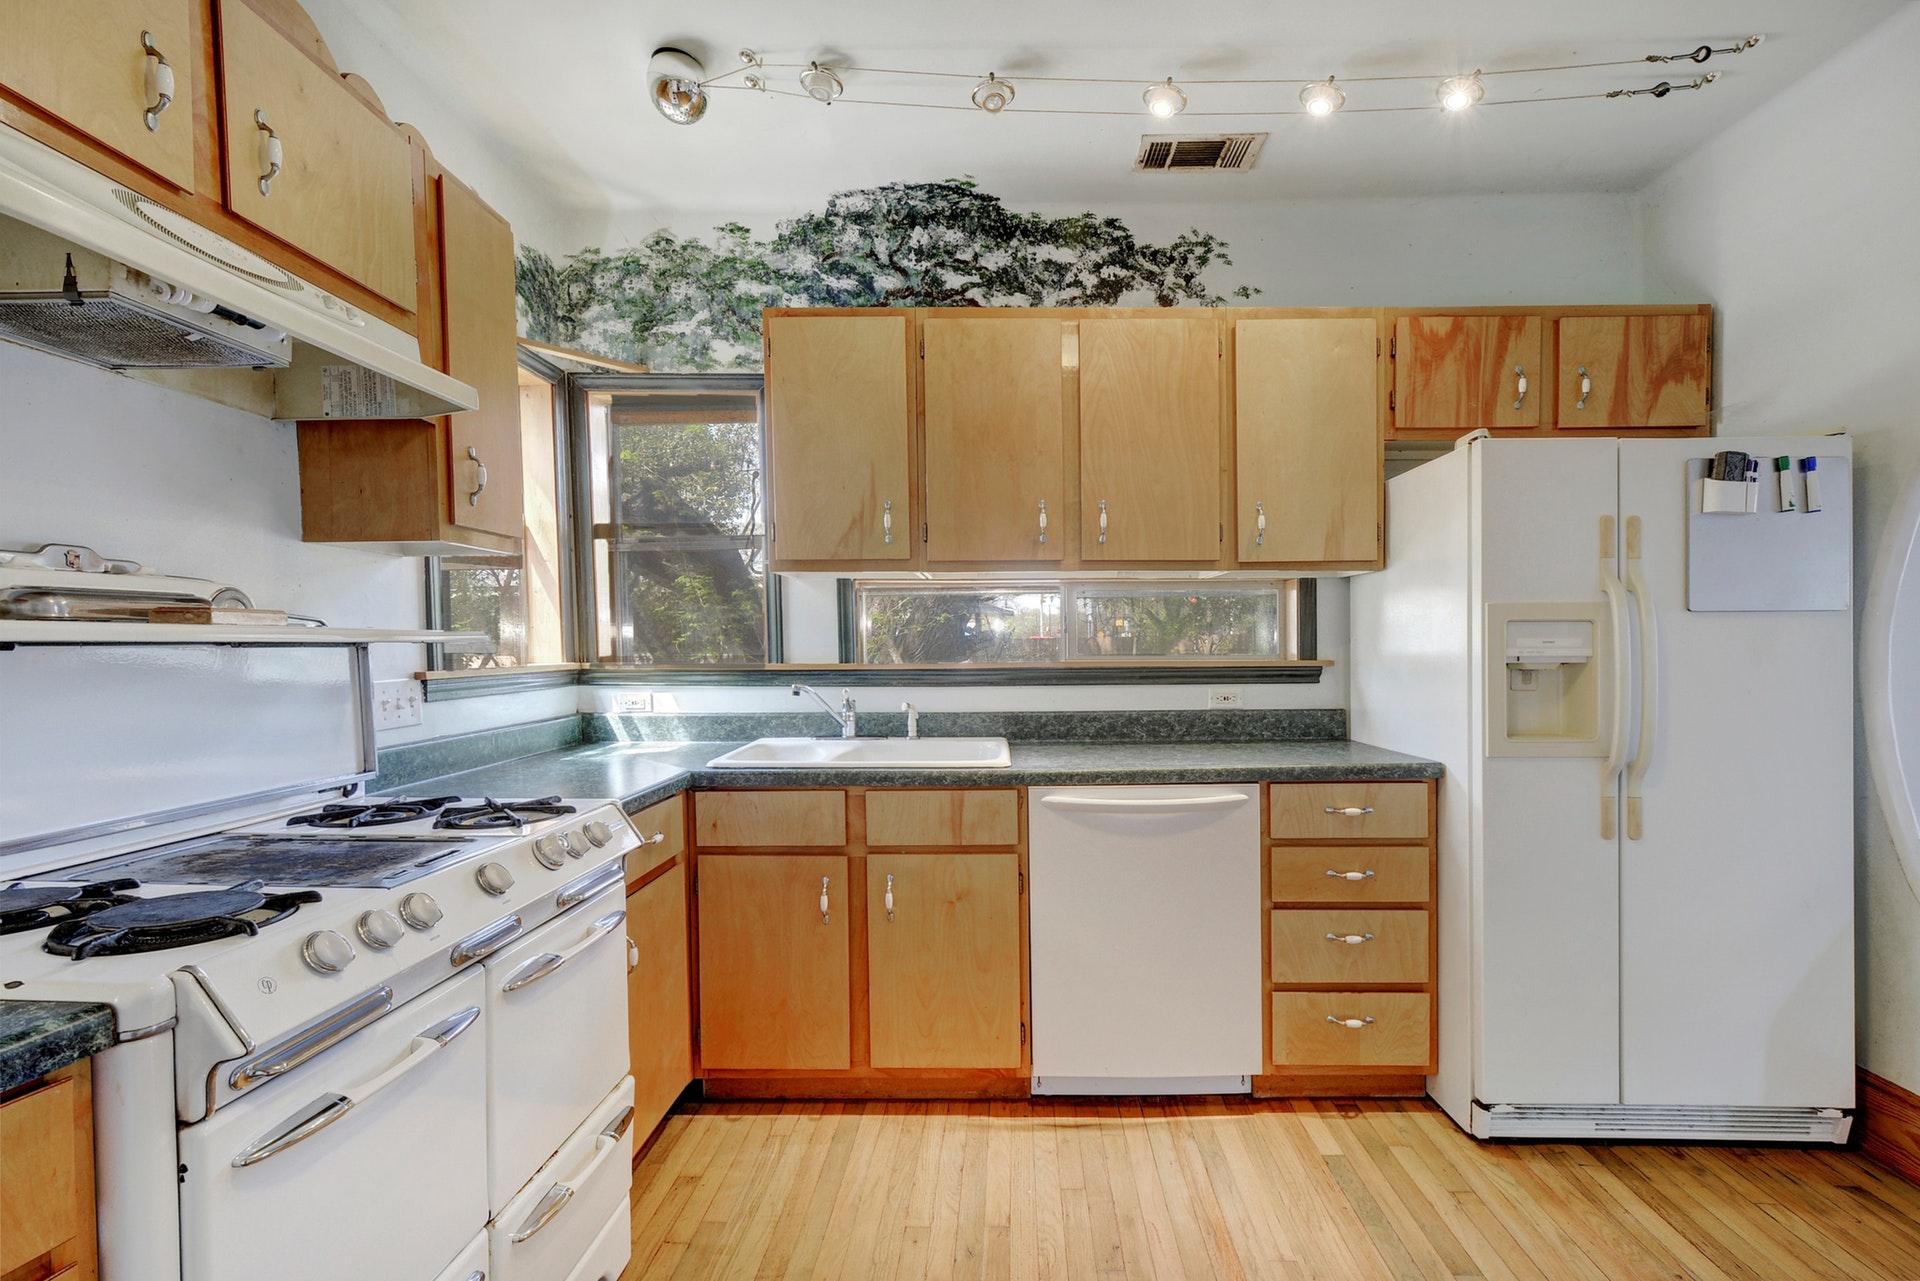 012-264873-Family Kitchen Dining010_6118495.jpg